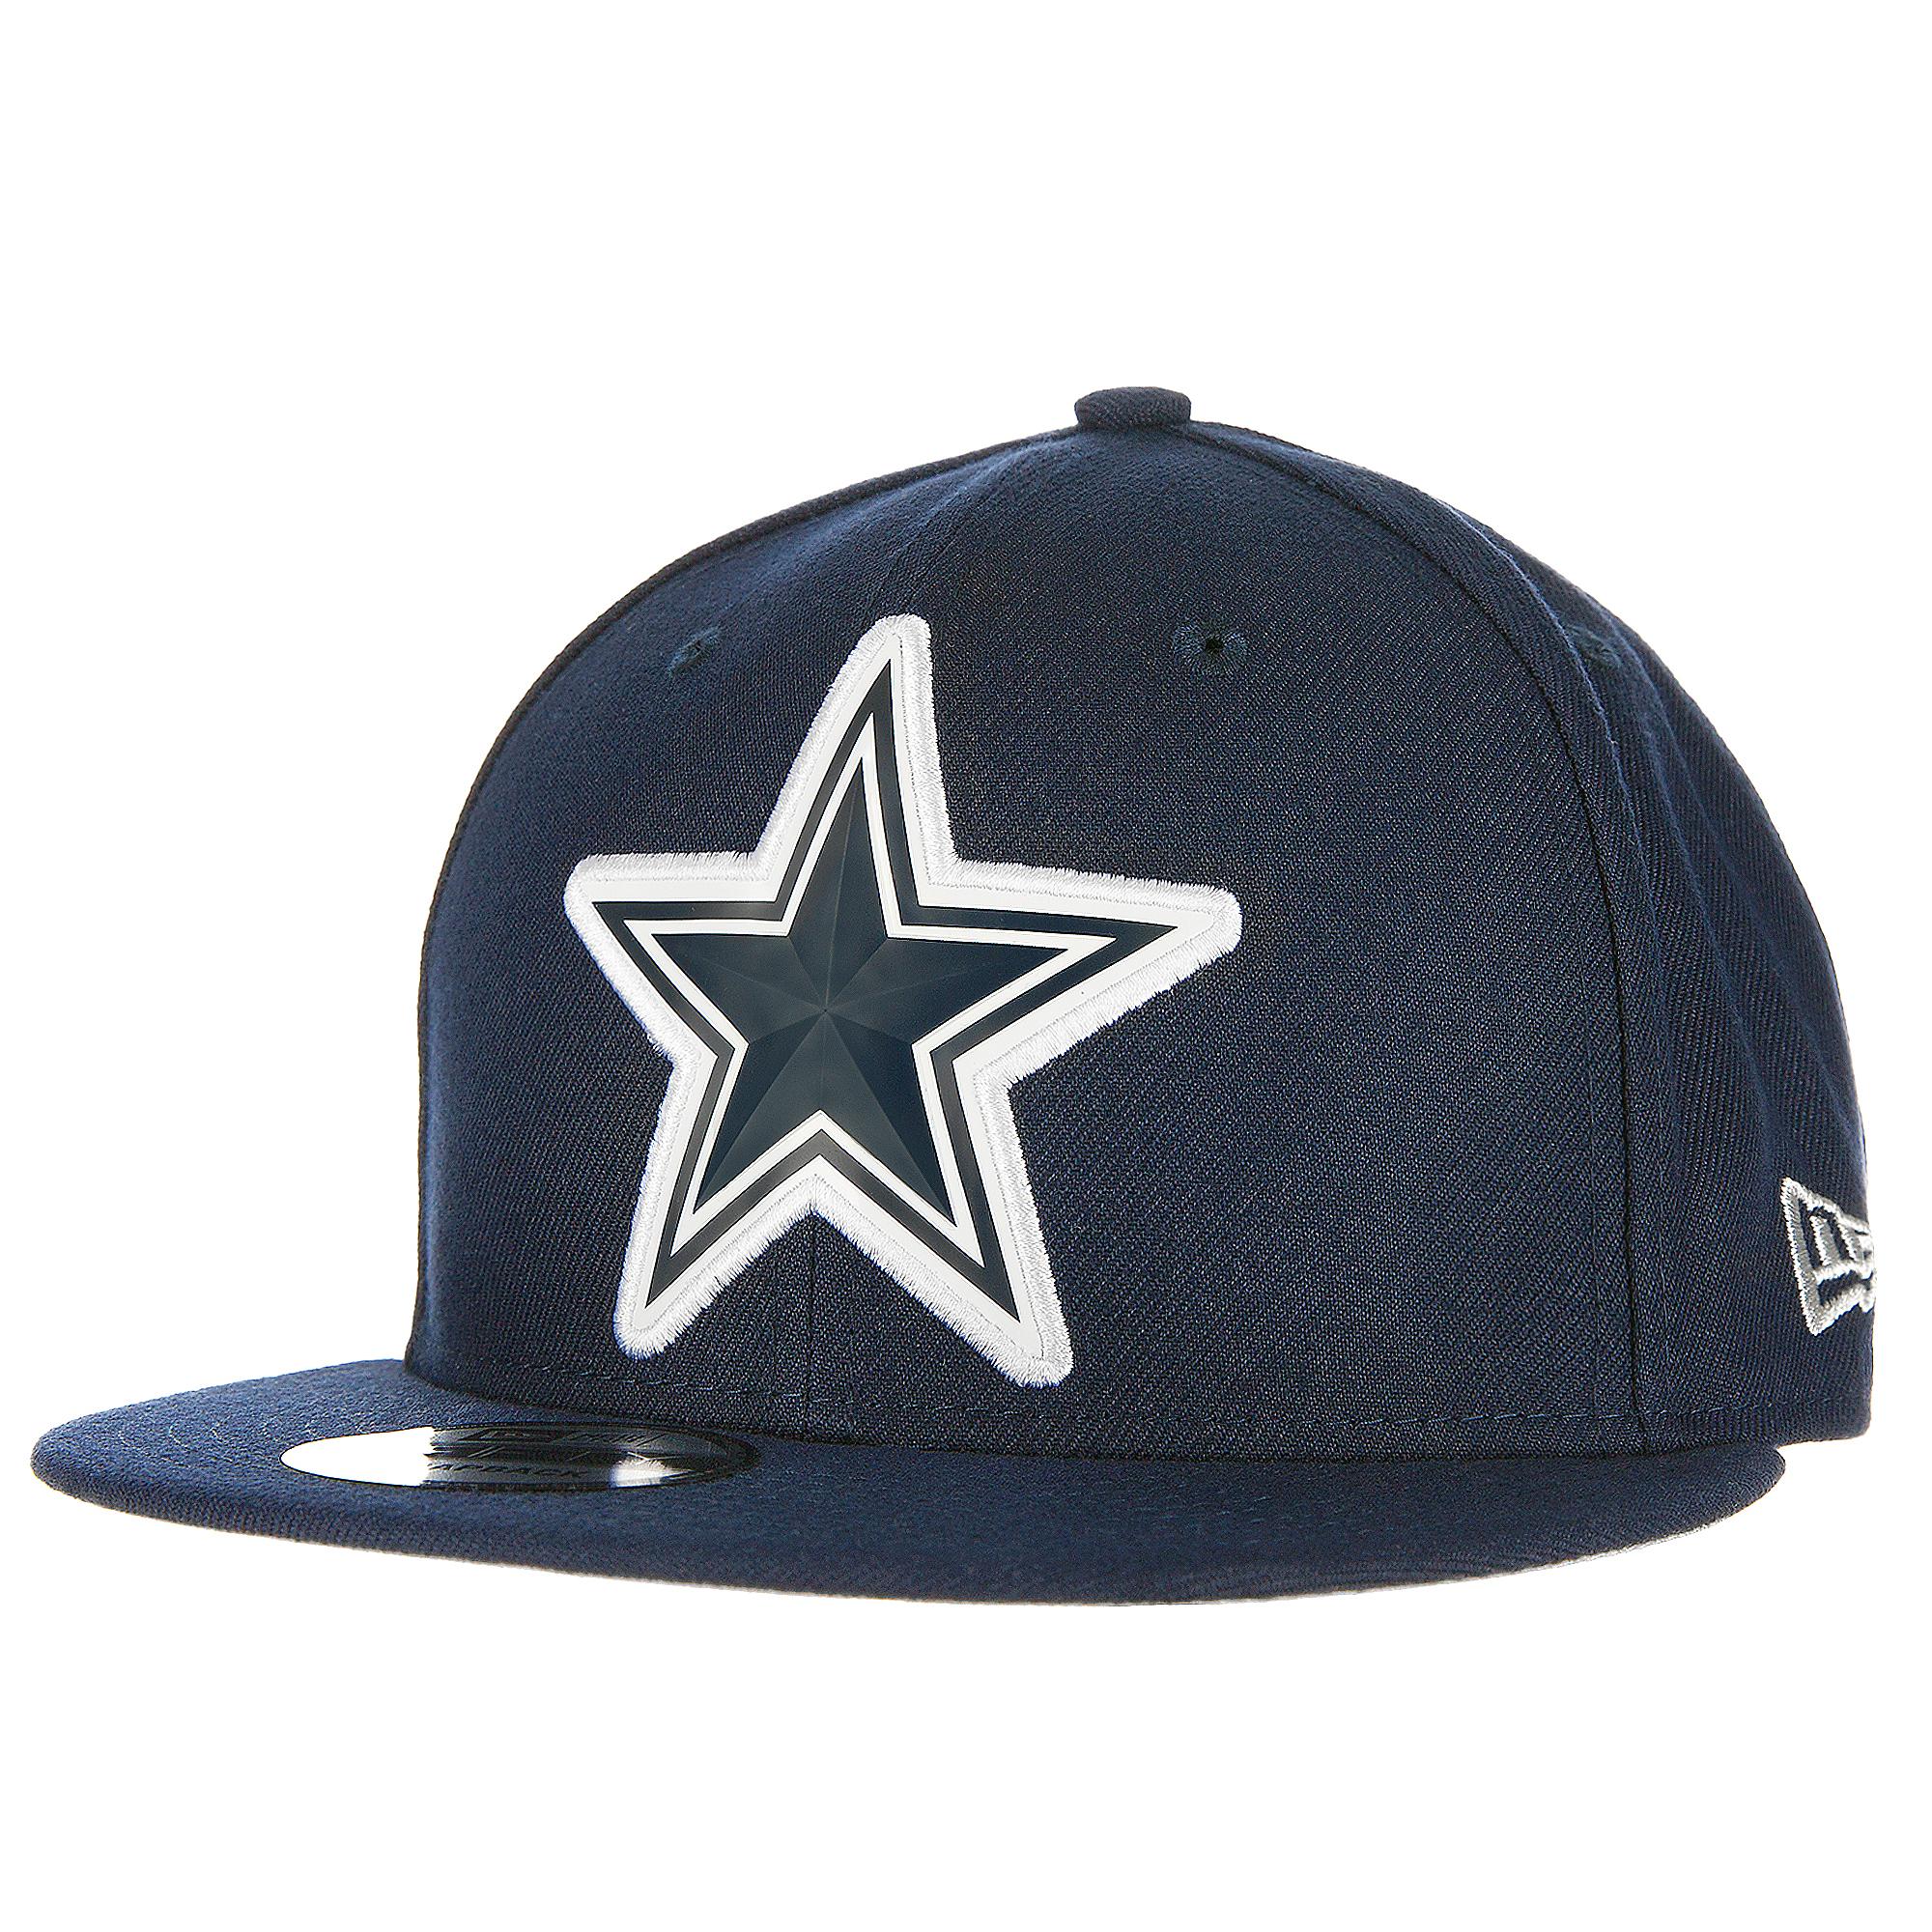 reputable site c8413 1bb1e Dallas Cowboys New Era Bold Bevel 9Fifty Cap   Dallas Cowboys Pro Shop